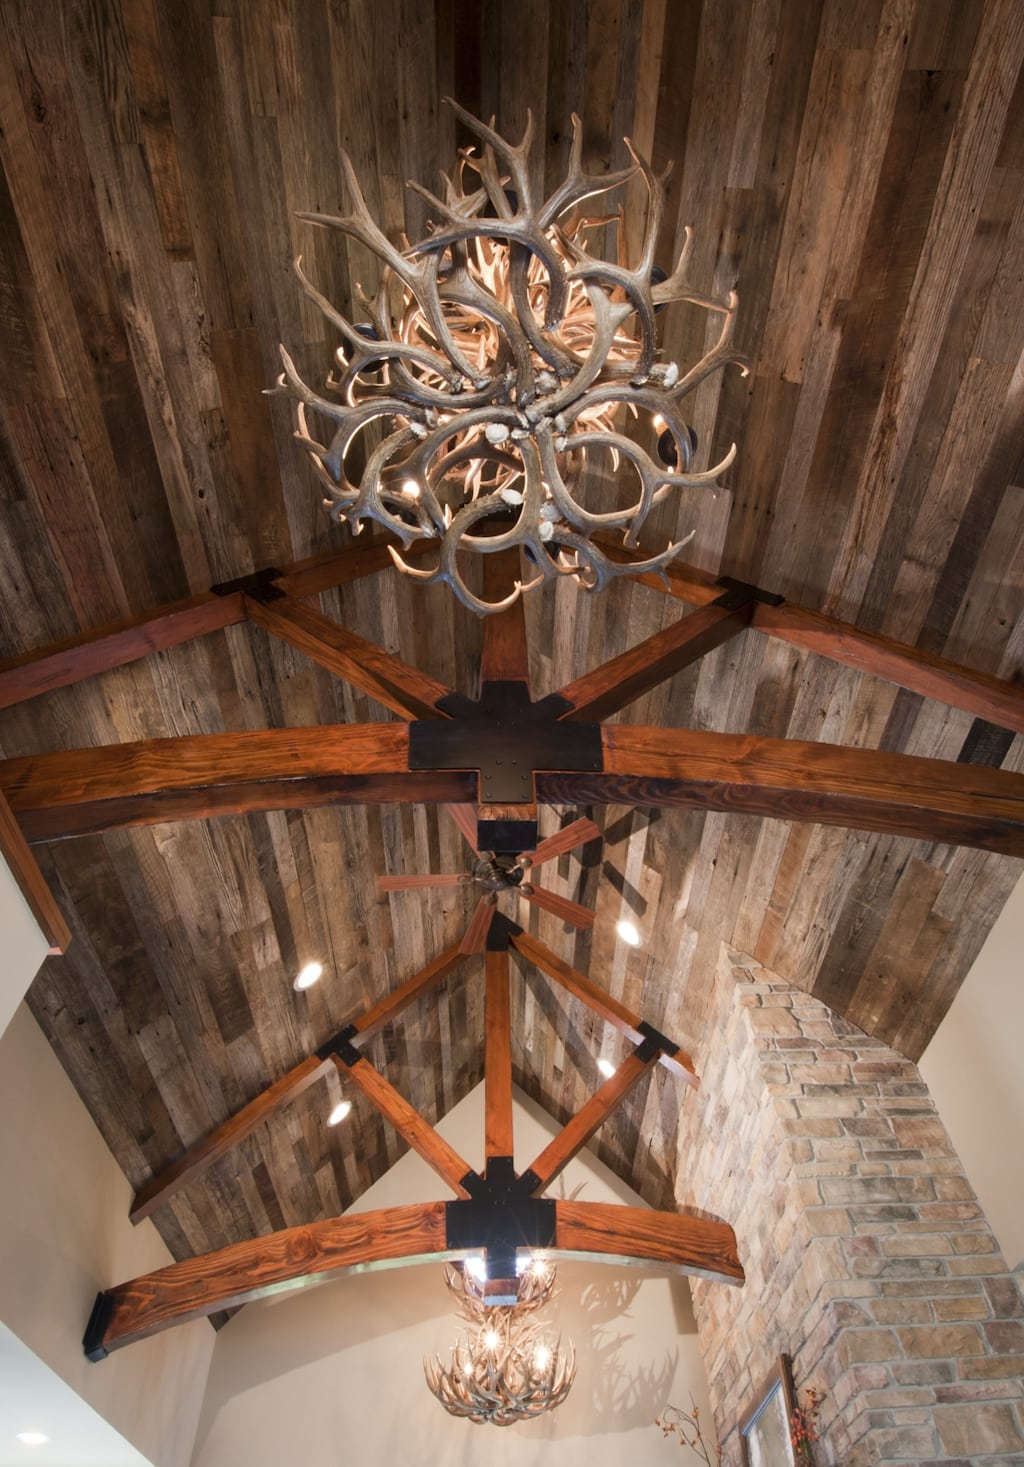 Vintage Wood Paneling: Antique Chestnut Wall Paneling